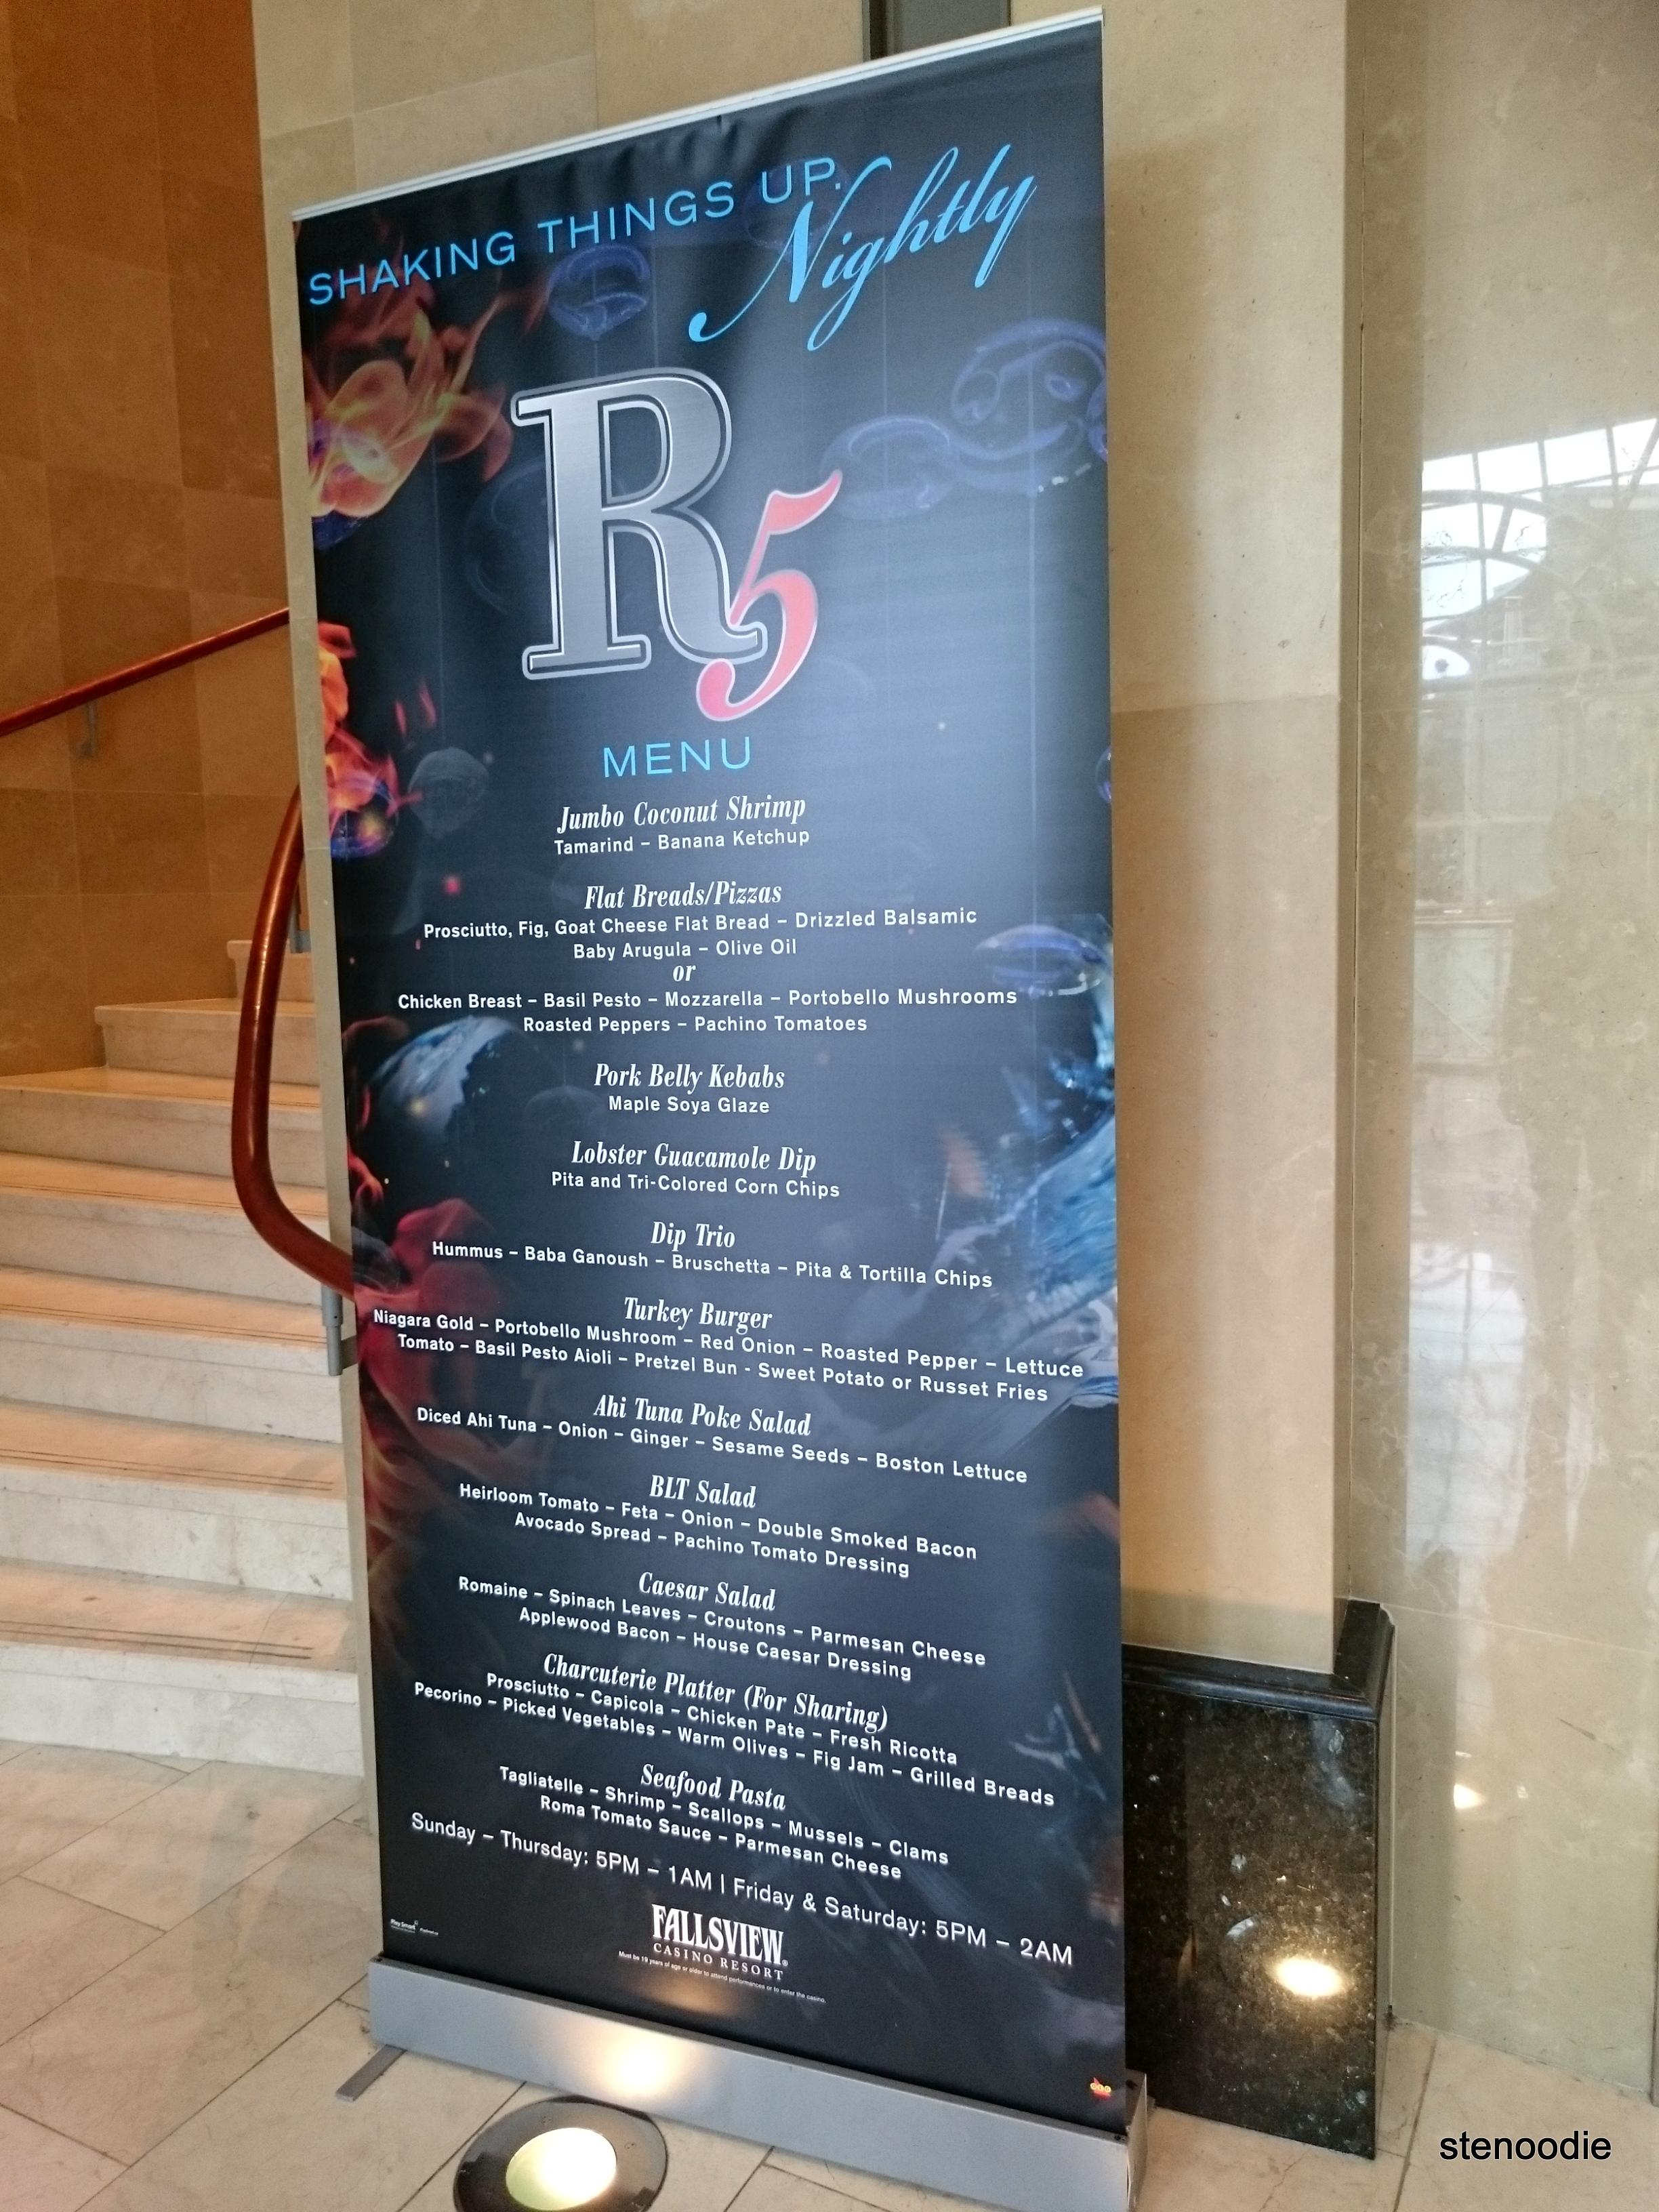 R5 banner